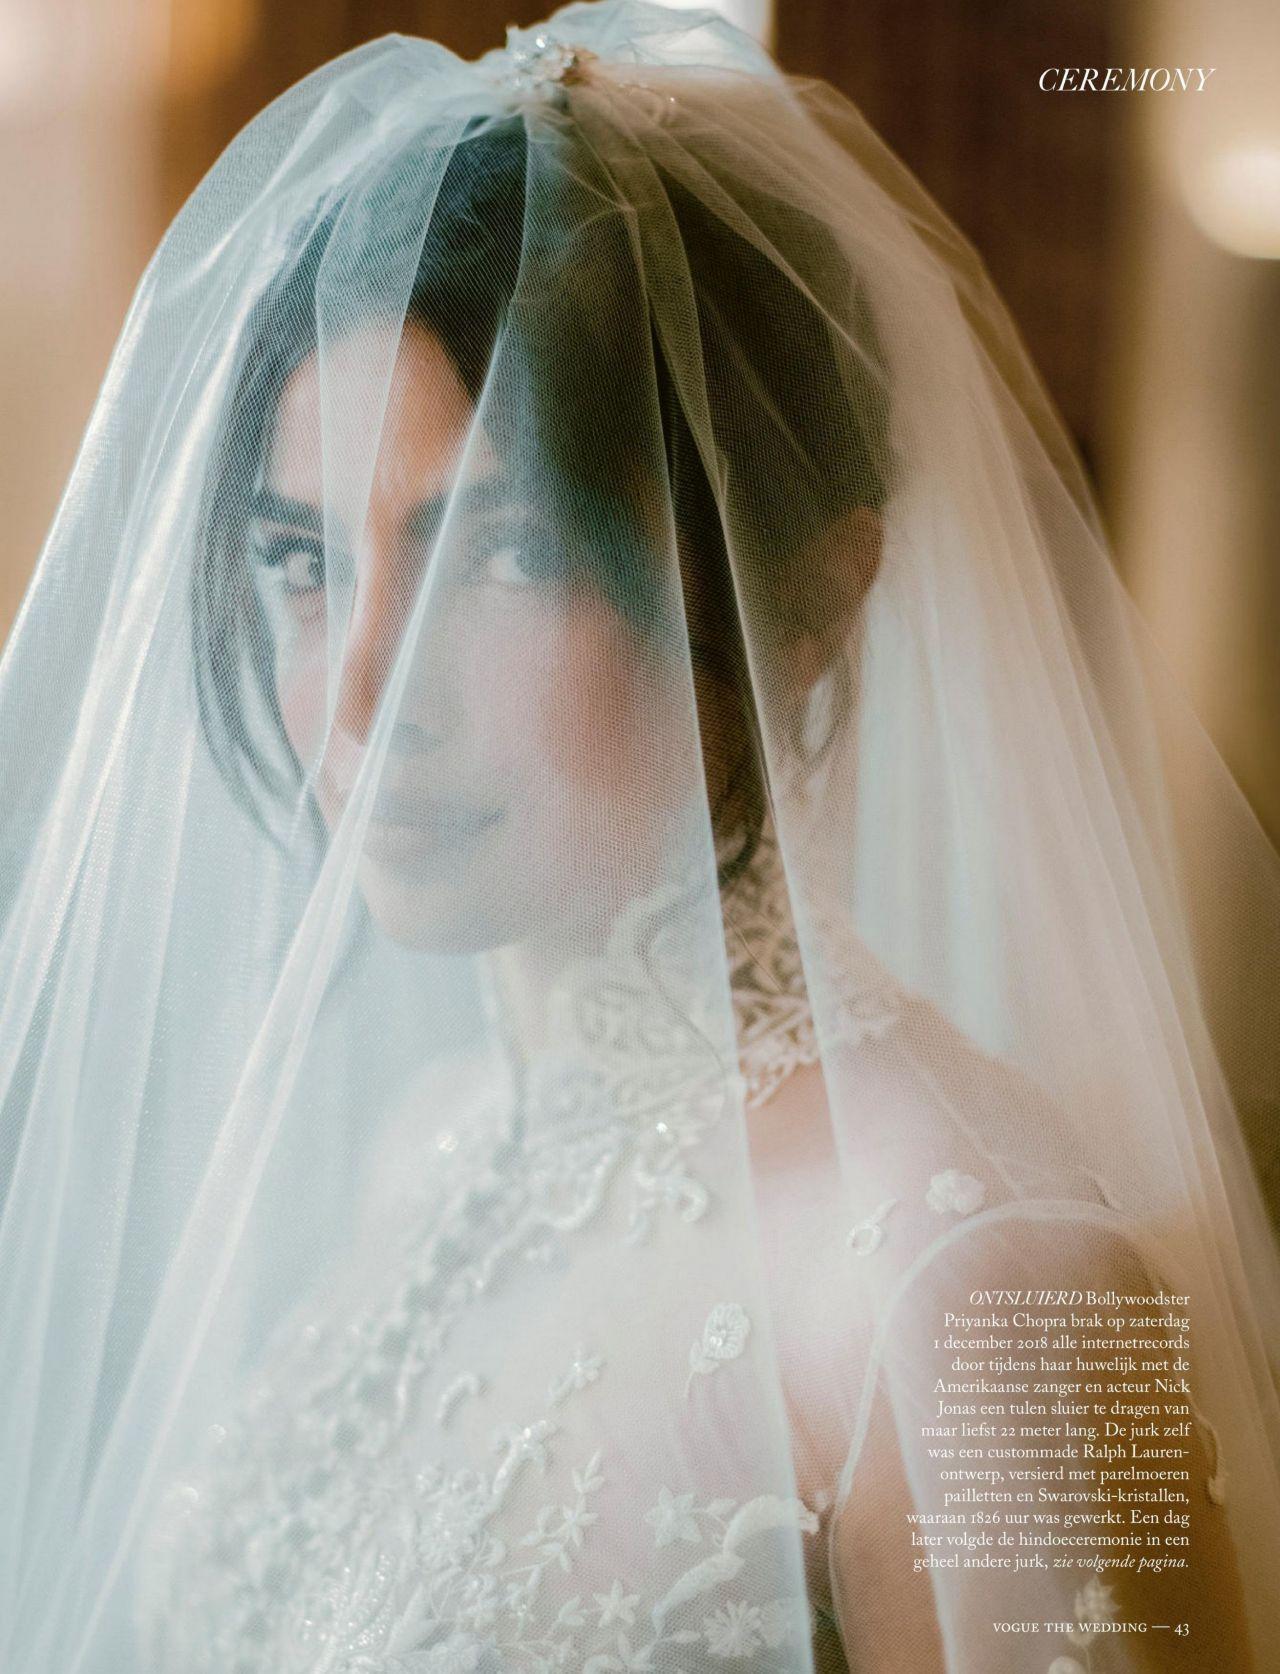 Cocktailjurk Bruiloft 2019.Priyanka Chopra Vogue Netherlands June 2019